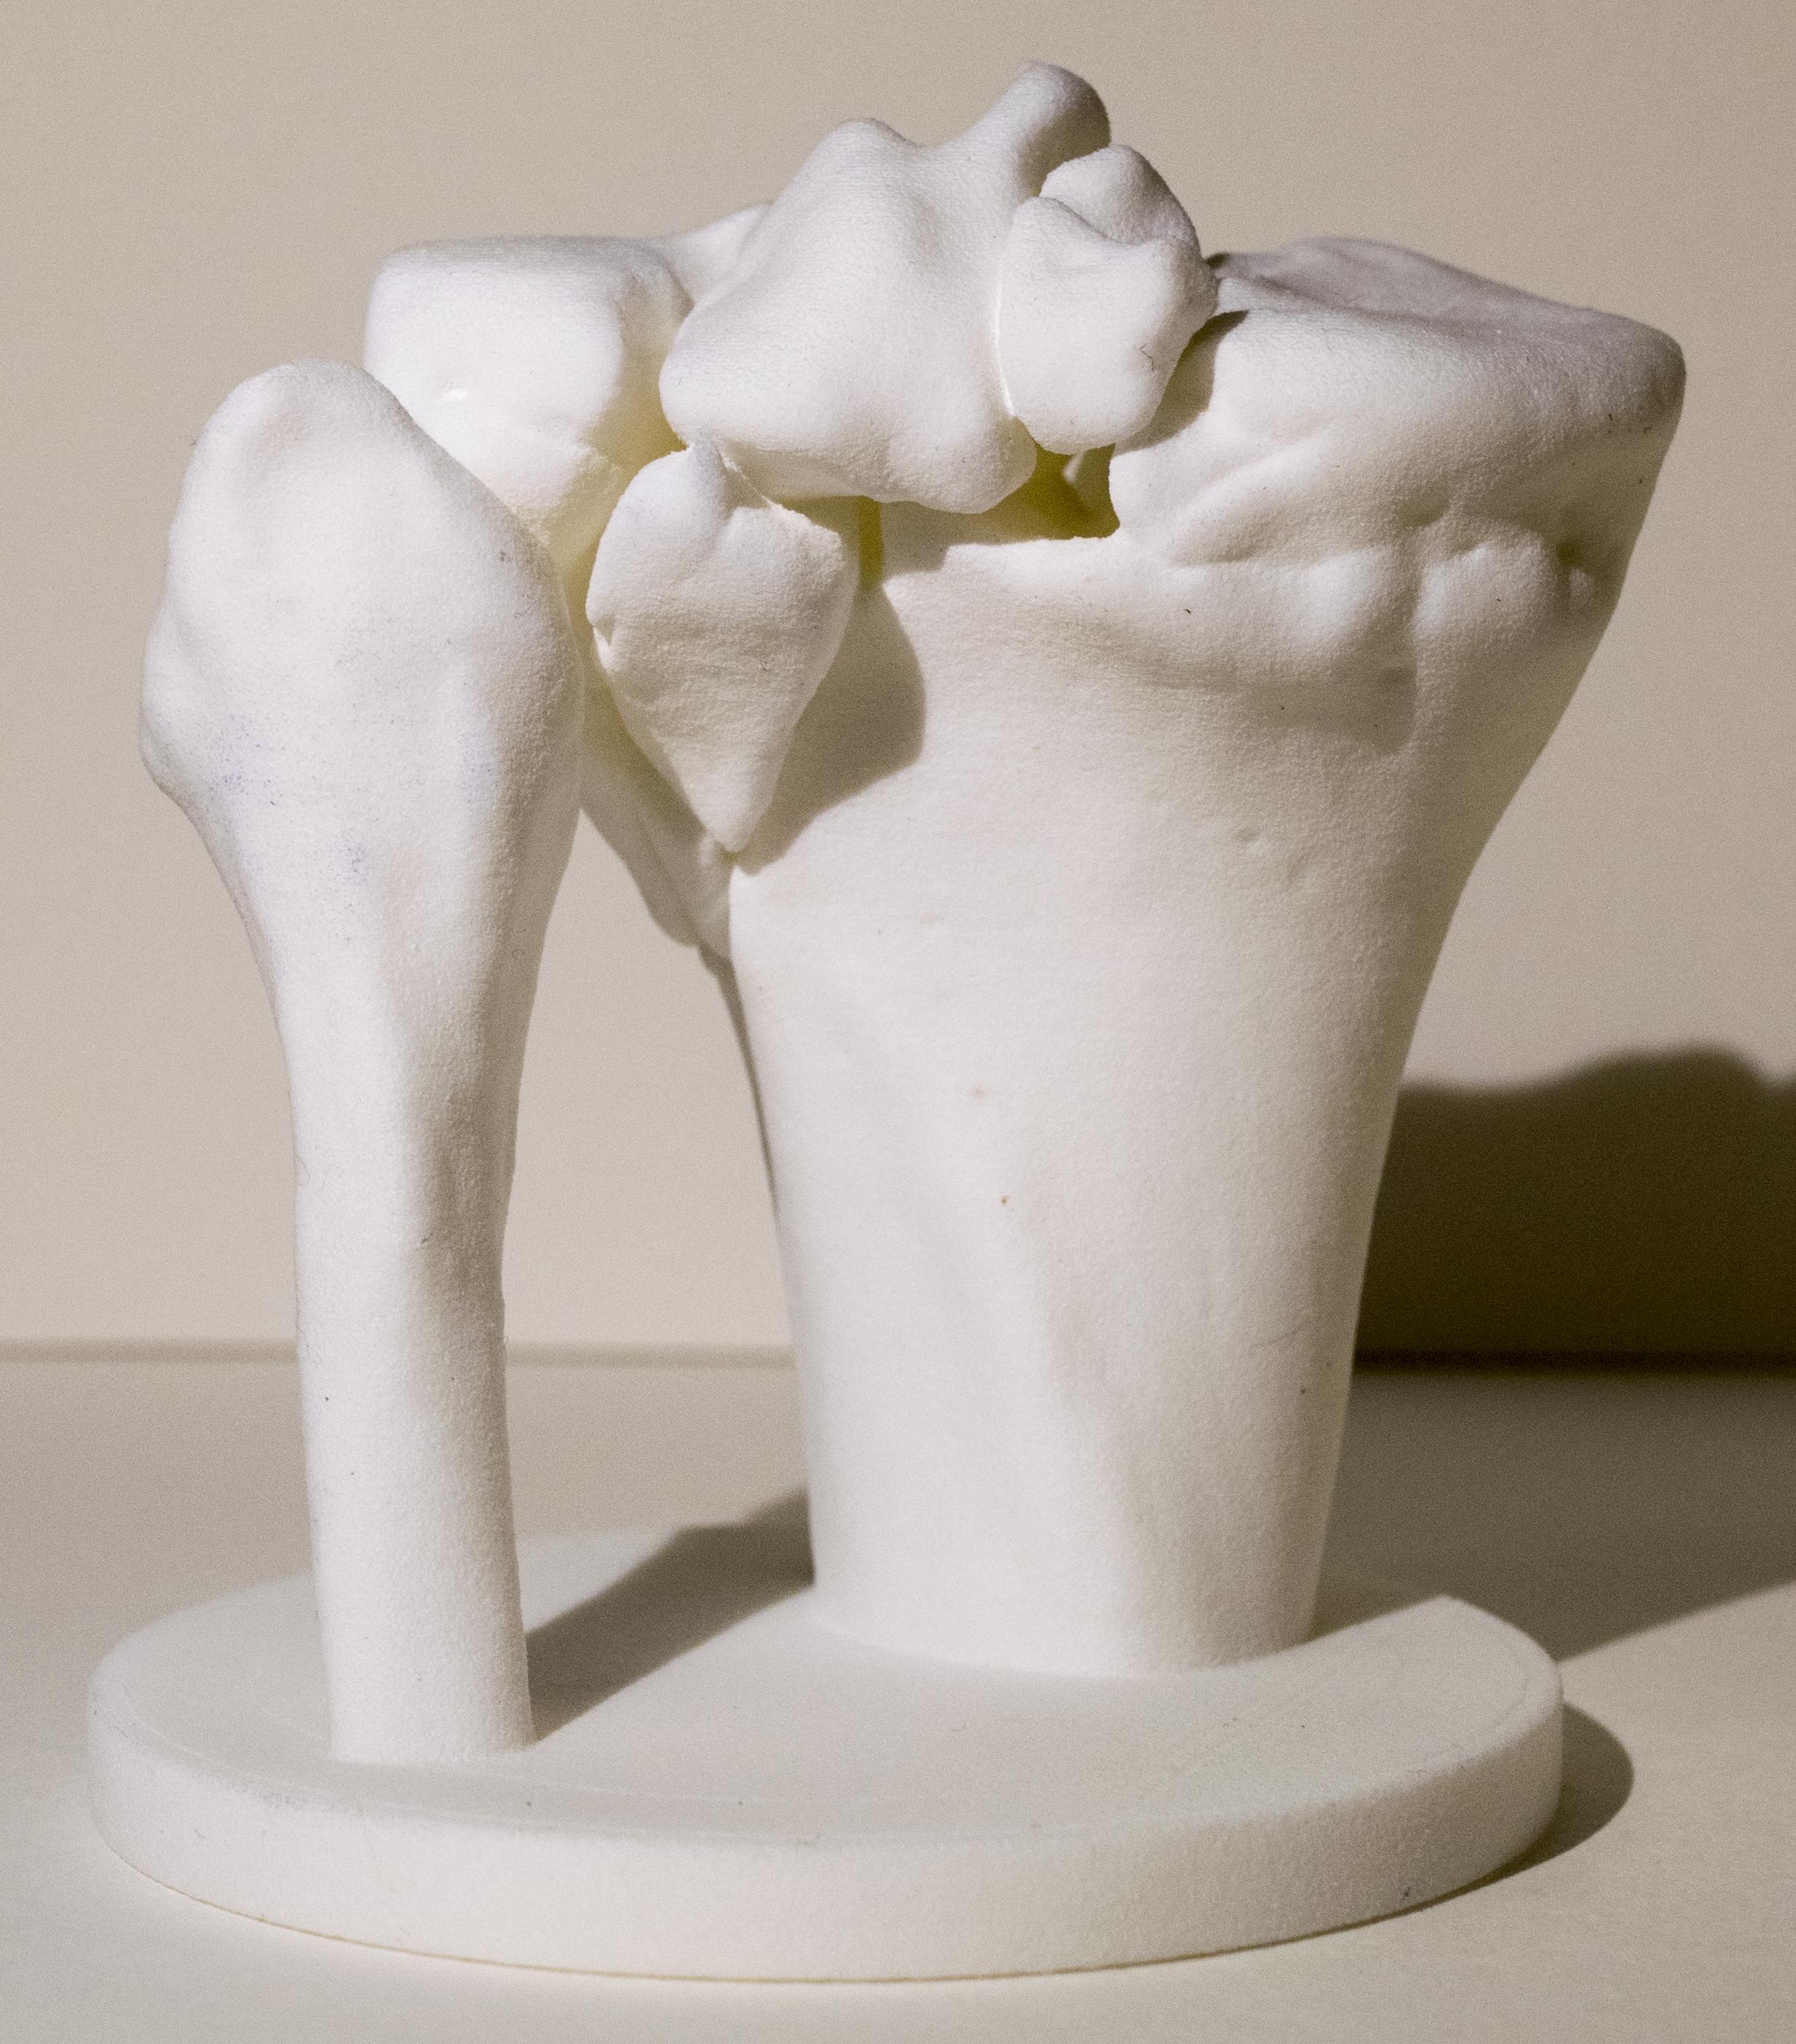 3D Print, Back